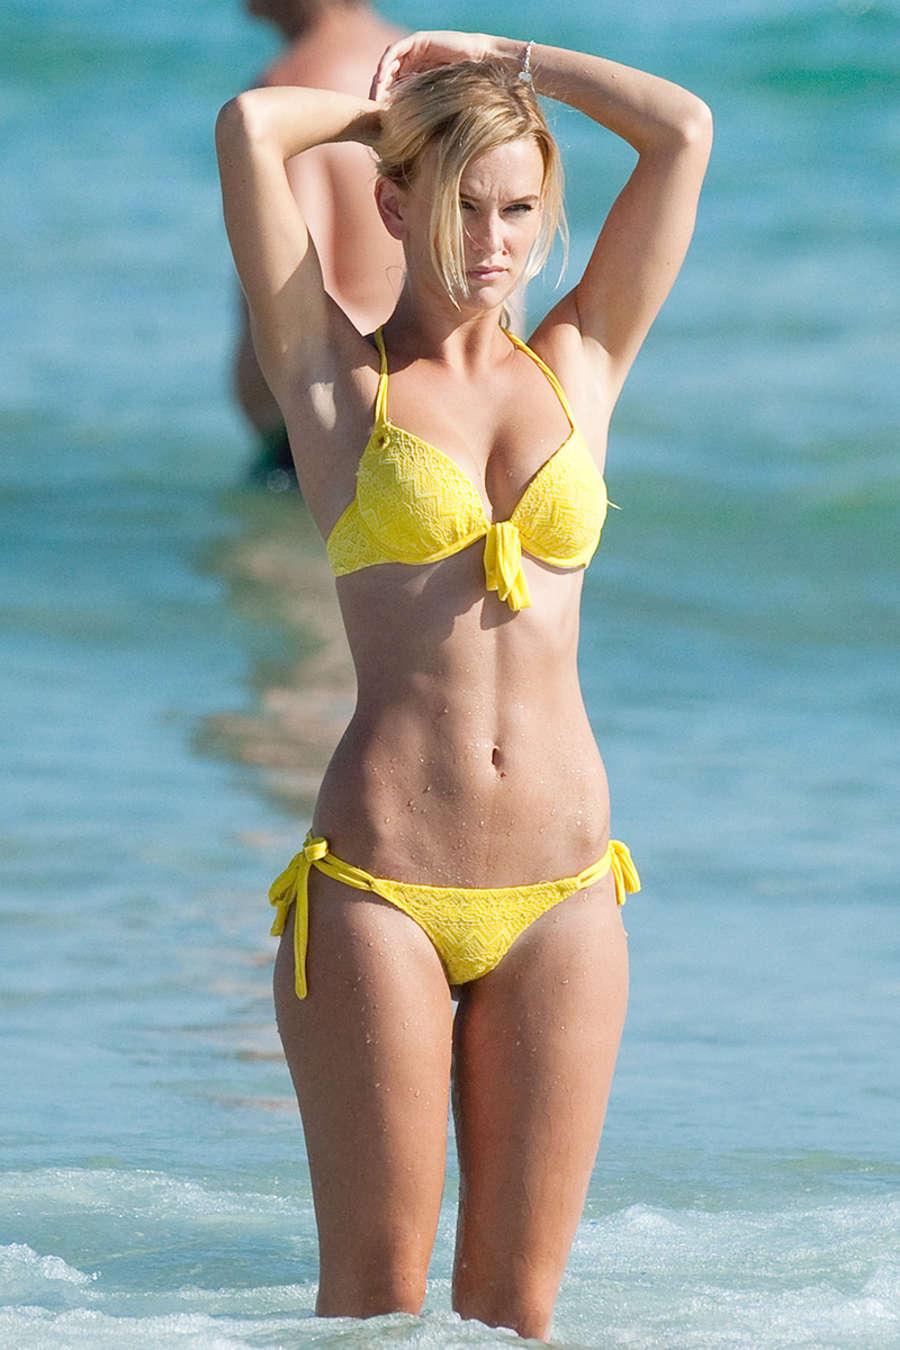 Jade bikini model